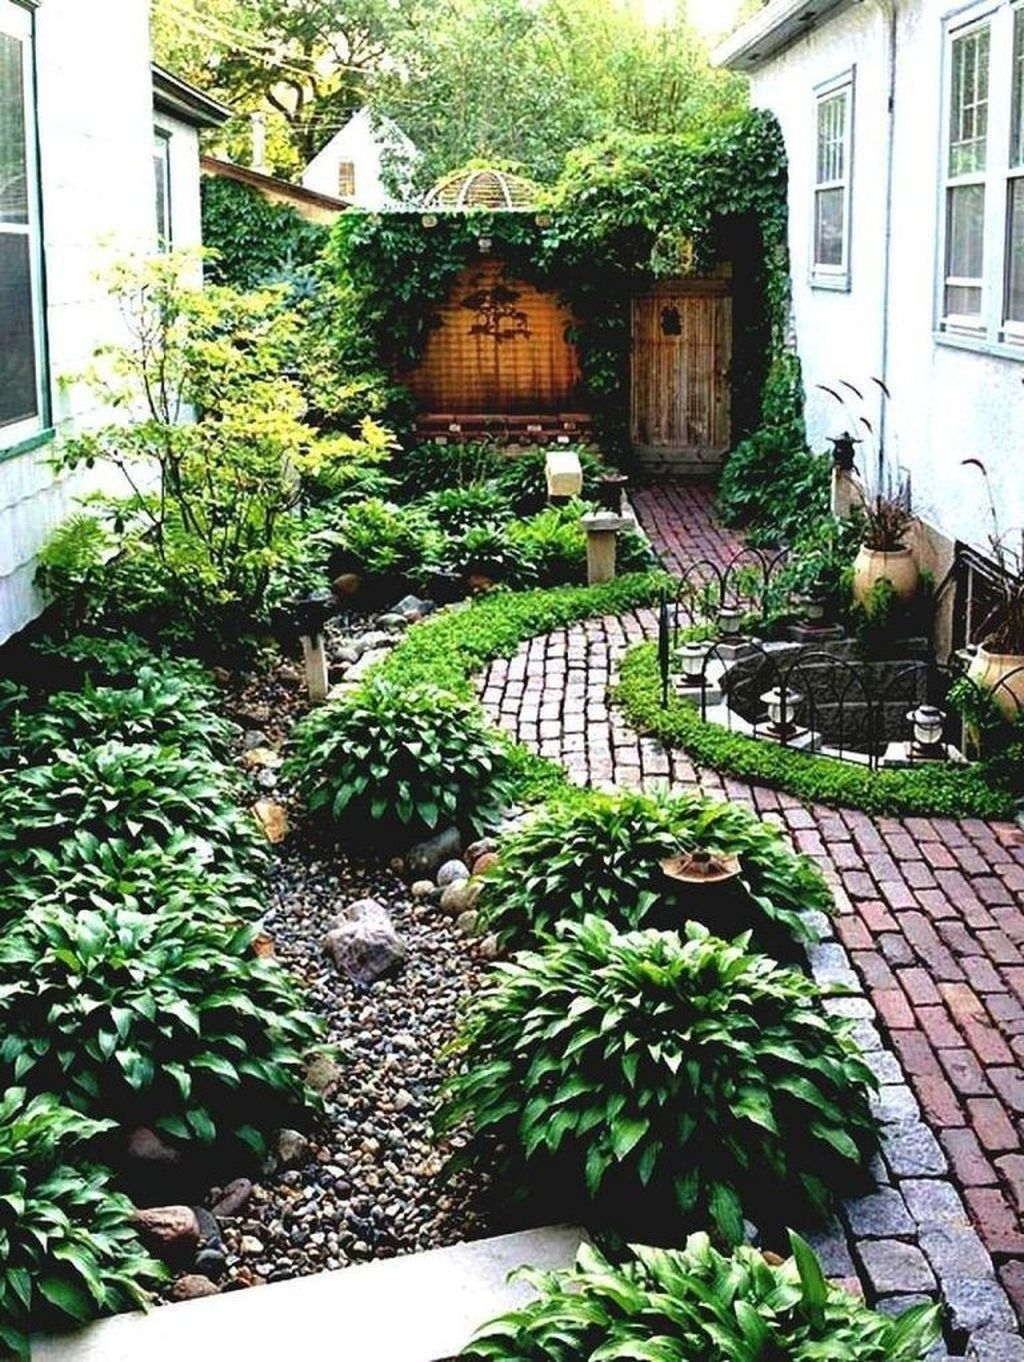 Inspiring Minimalist Frontyard Design Ideas To Try Asap 13